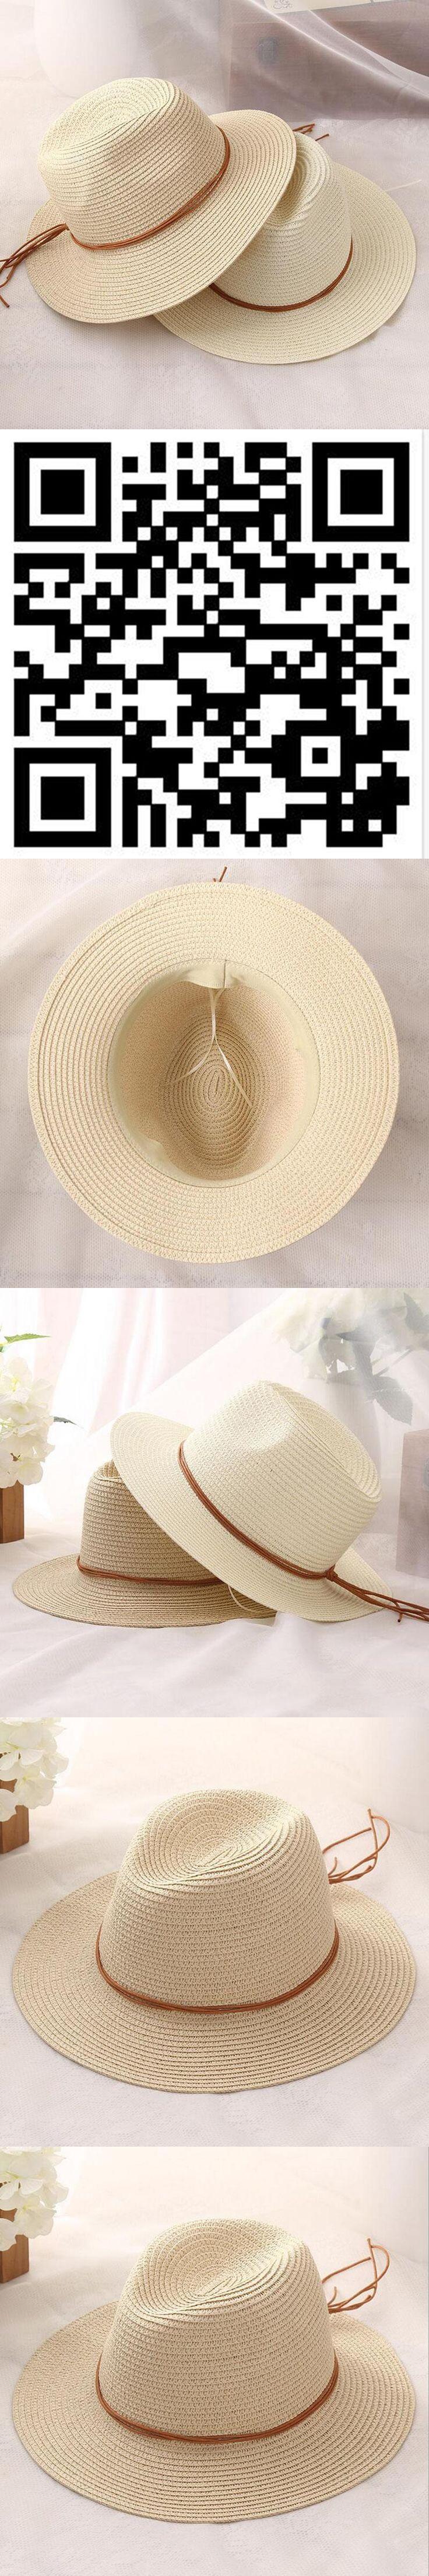 Women Summer straw Sun hat Boho Beach wide Brim Fedora hat Sunhat Trilby panama Hat Gangster sombrero men Cap